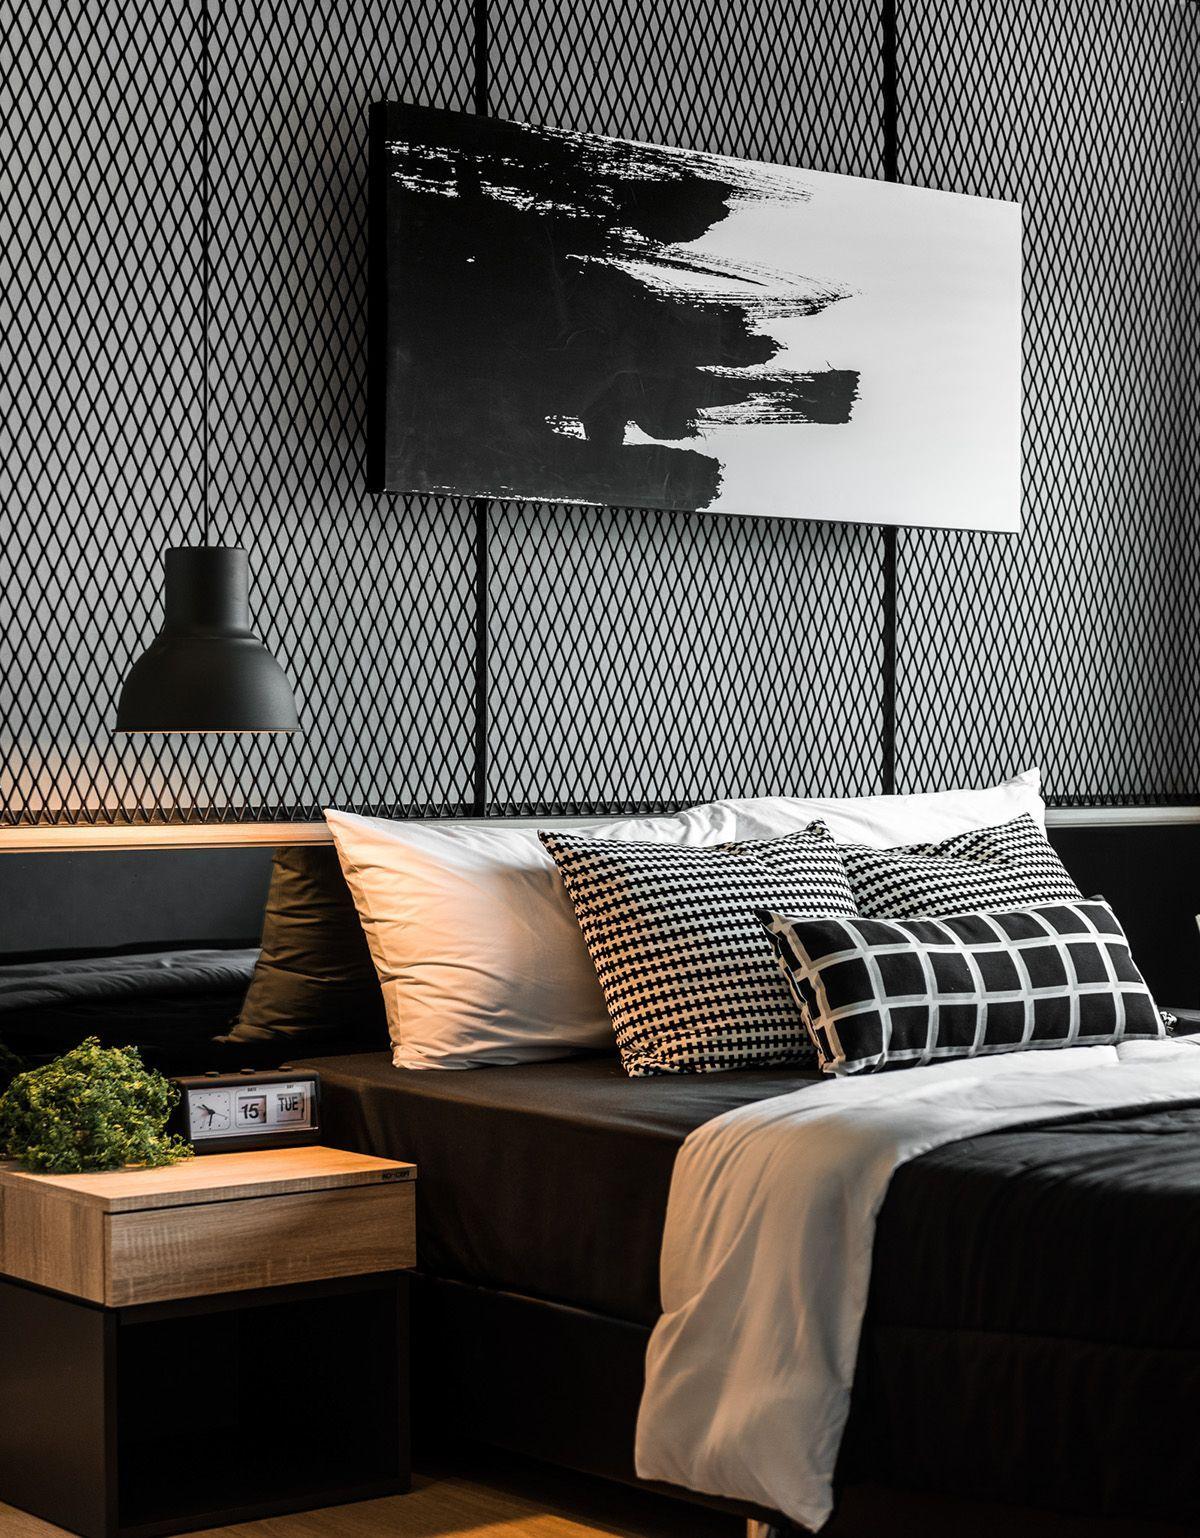 15 Best Modern Interior Design Ideas For Your Home Decoration Bedroom Interior Wall Decor Bedroom Home Decor Bedroom